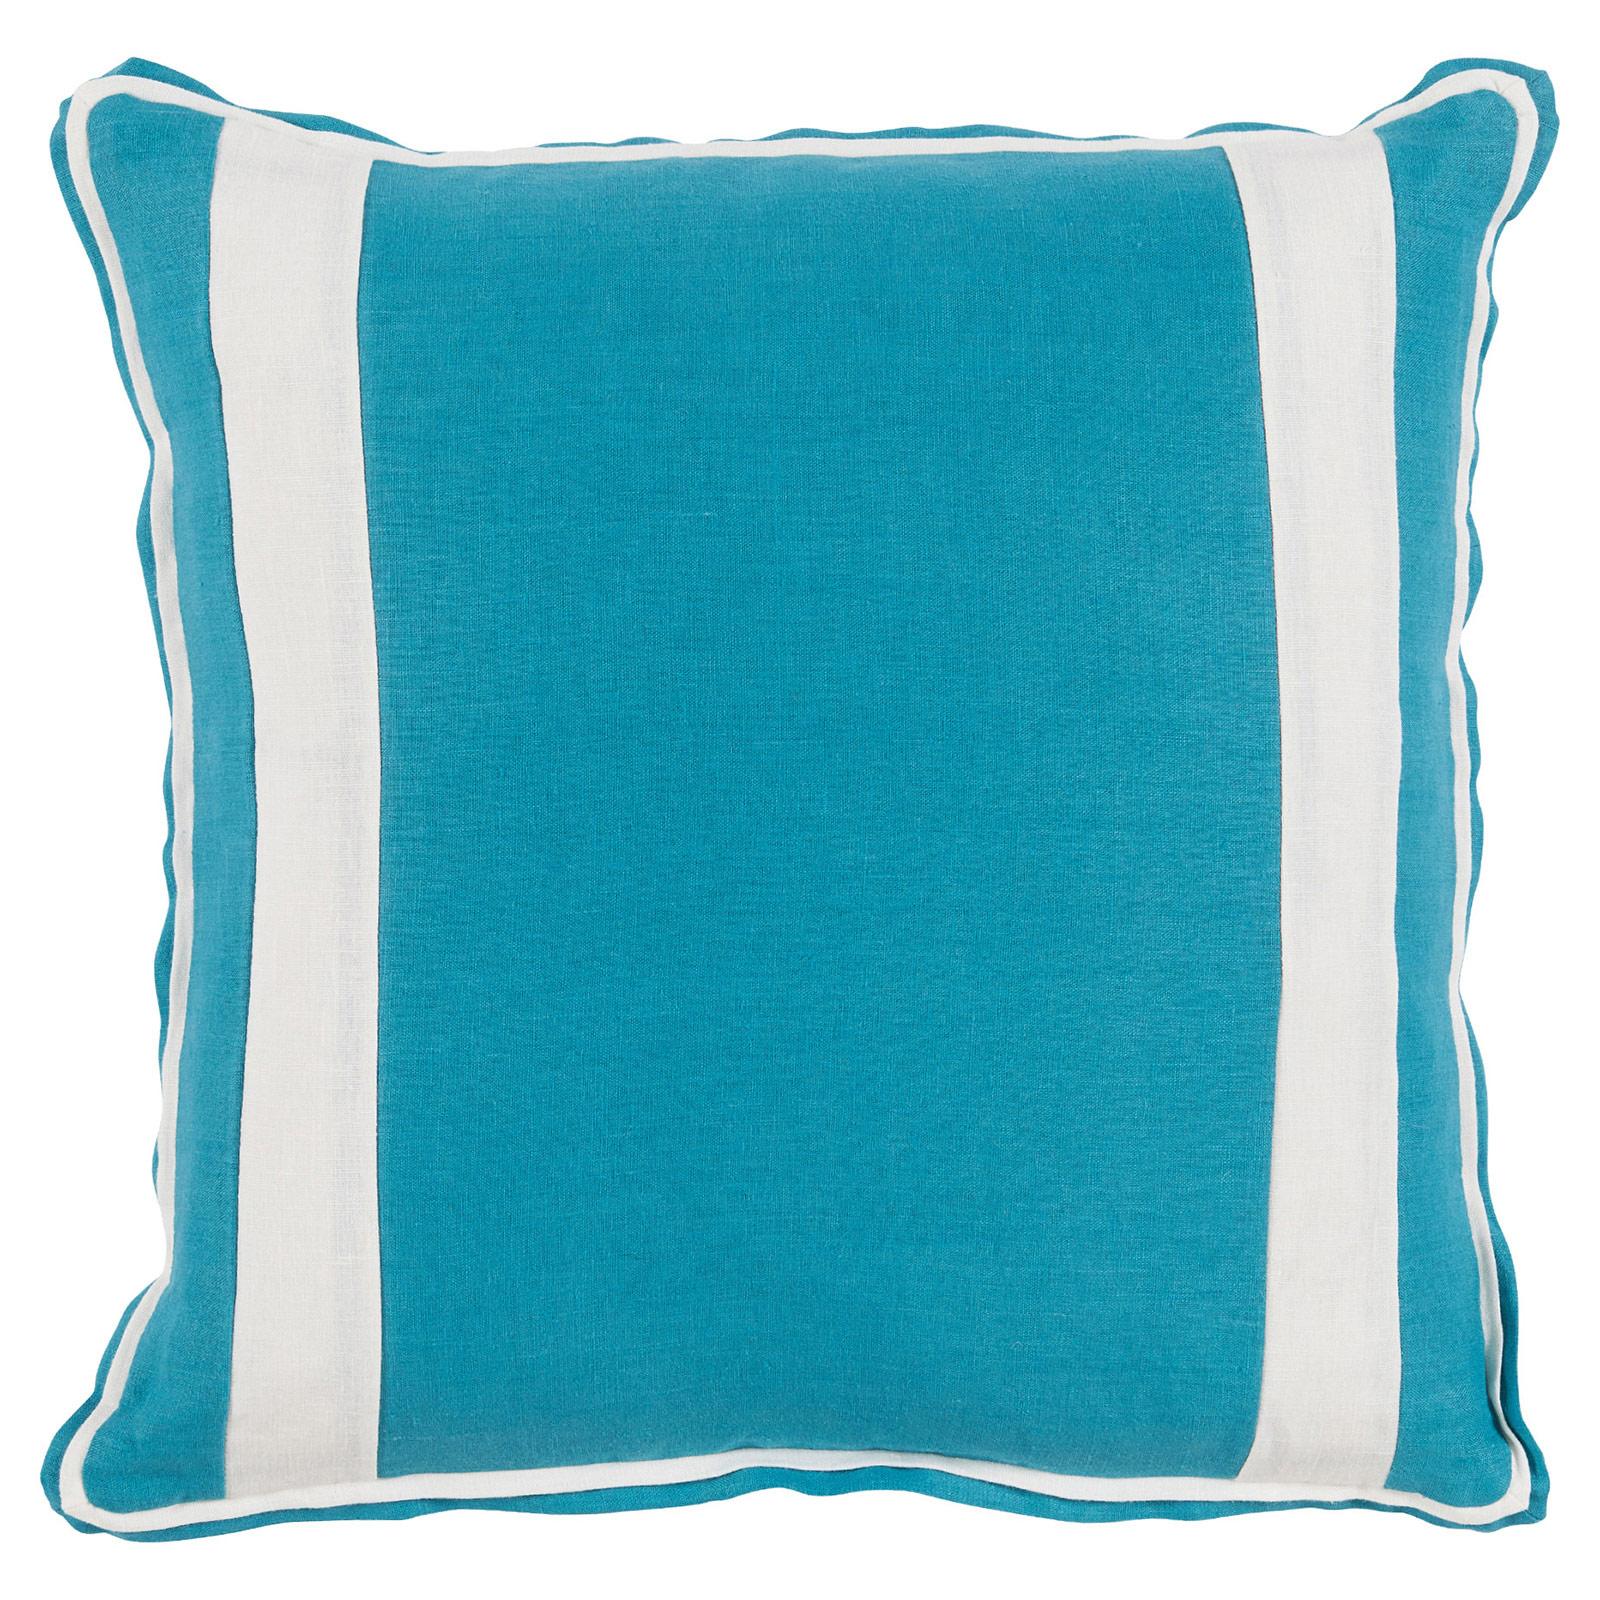 Bobbi Modern Classic Bold Stripe Aqua Linen Pillow - 20x20